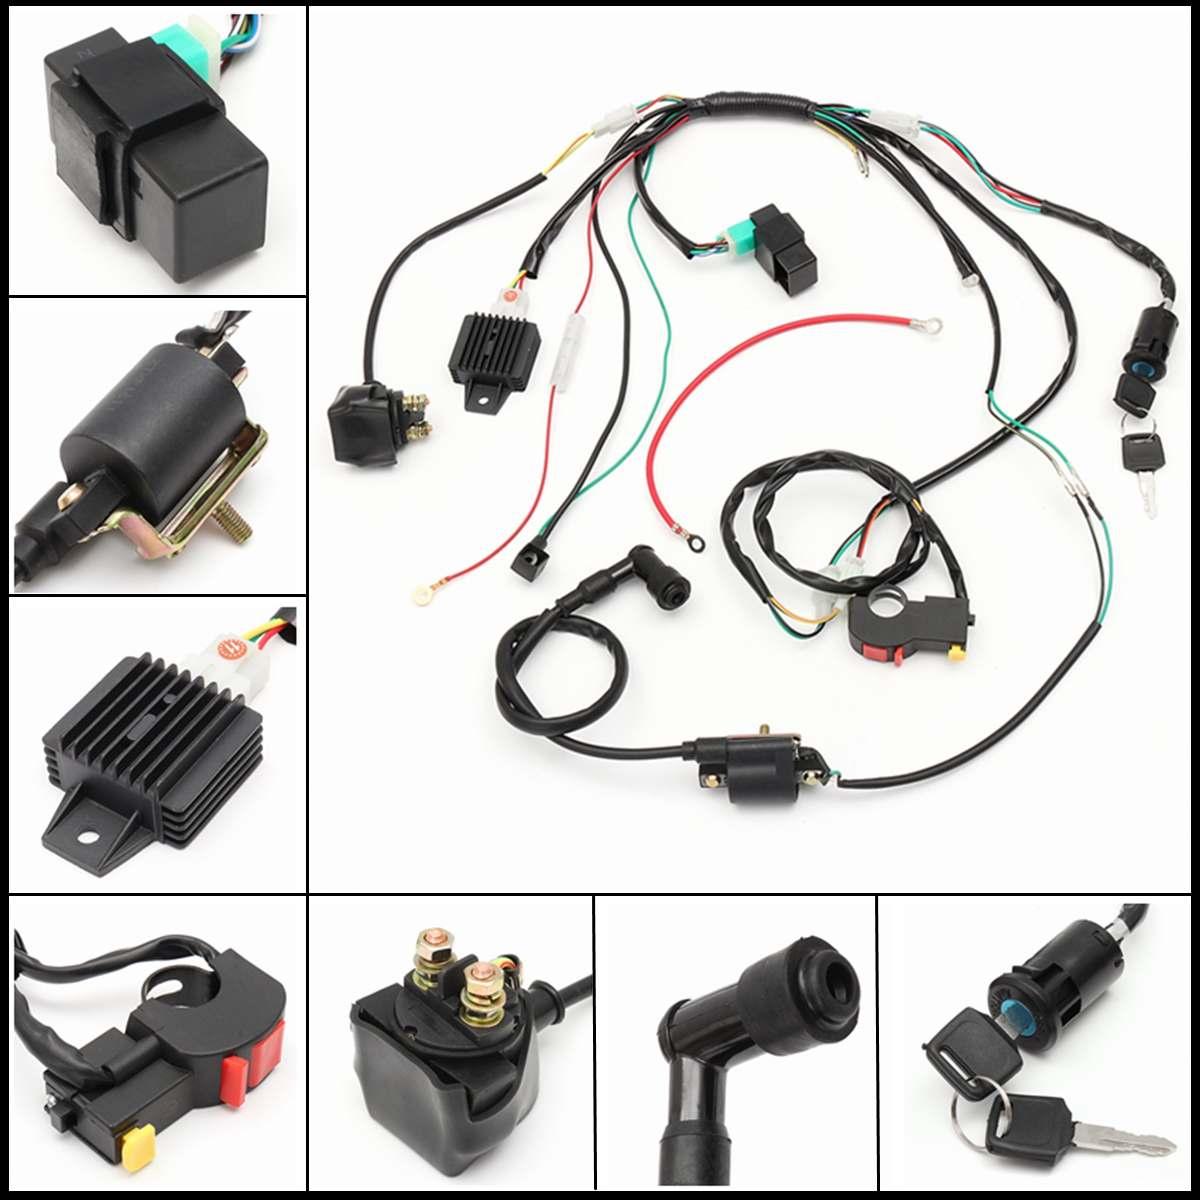 Aramox Wiring Harness Motorcycle Accessory Electrical Starting Wiring Harness 50cc 70cc 90cc 110cc 125cc